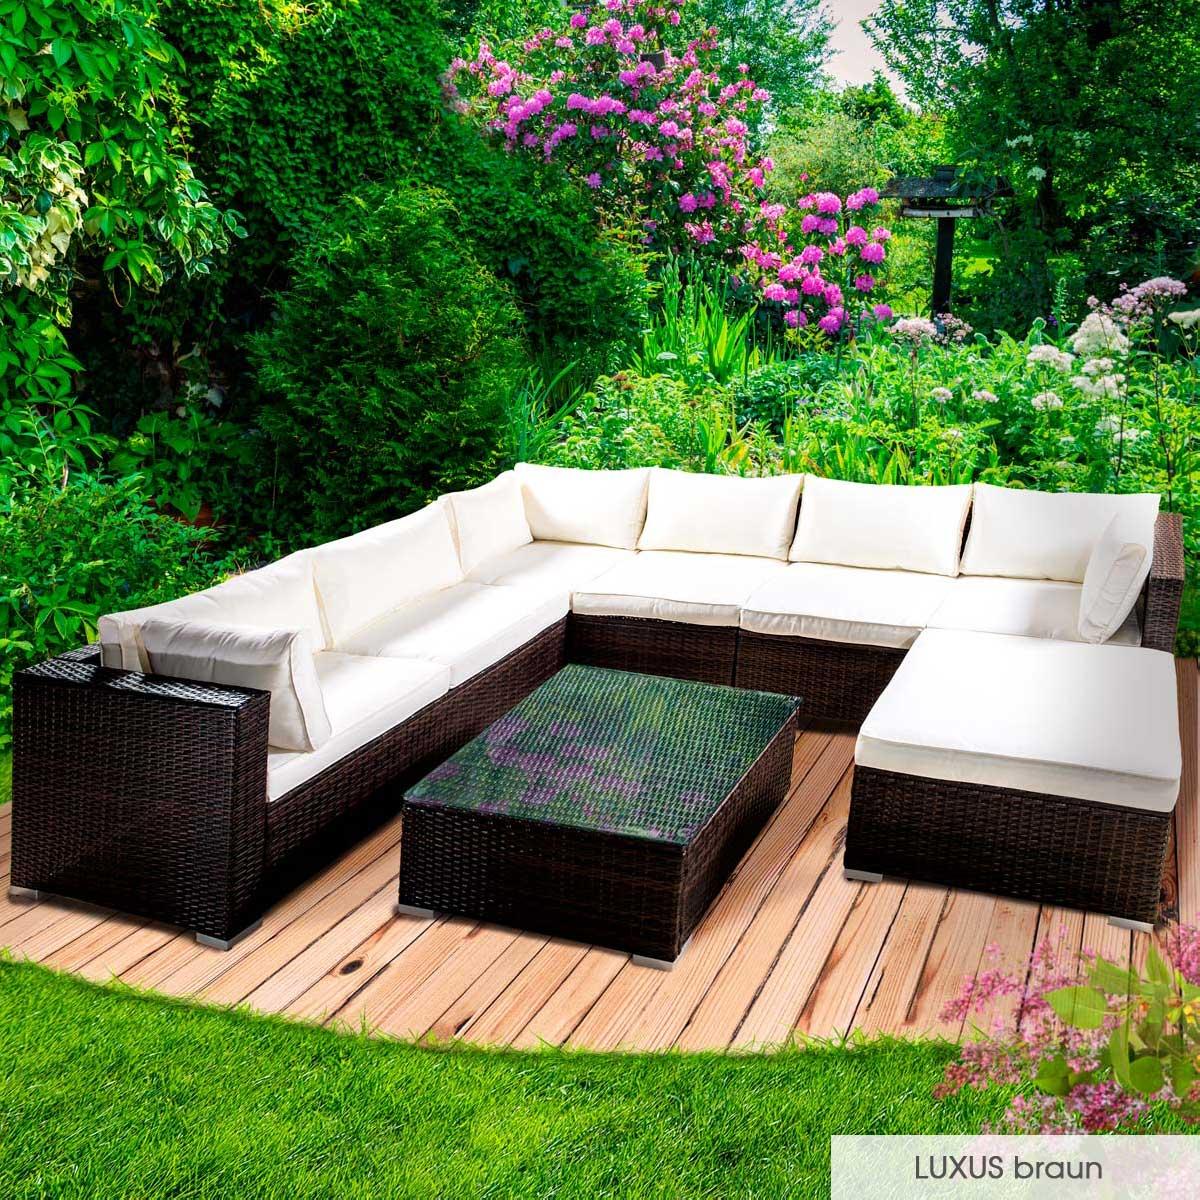 Gartenmoebel-Poly-Rattan-Lounge-Moebel-Sitzgarnitur-Gartengarnitur-Sitzgruppe-Sofa Indexbild 35